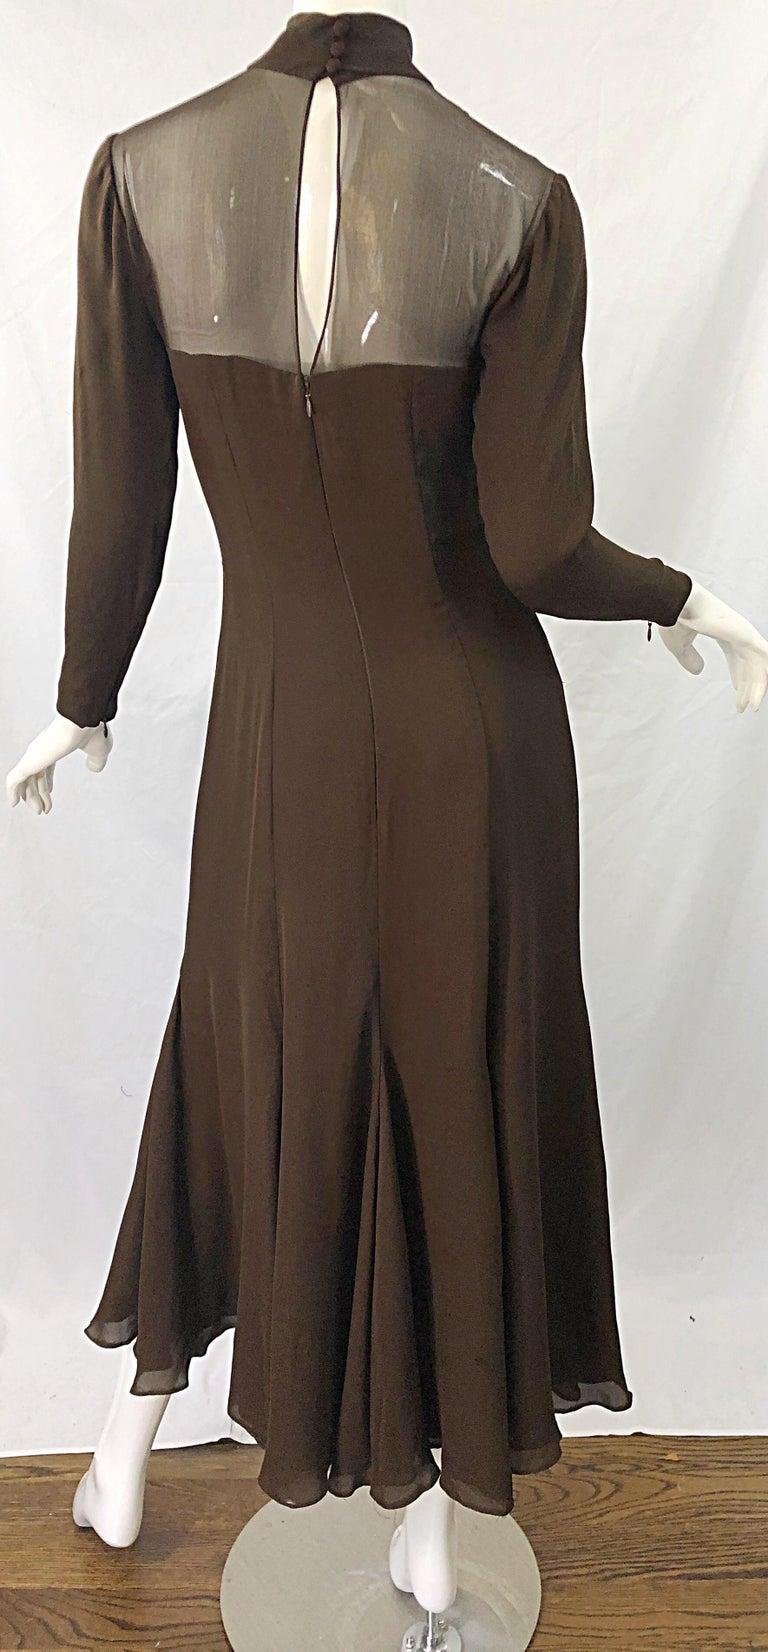 1970s Nolan Miller Couture Chocolate Brown Silk Chiffon Vintage 70s Midi Dress For Sale 2